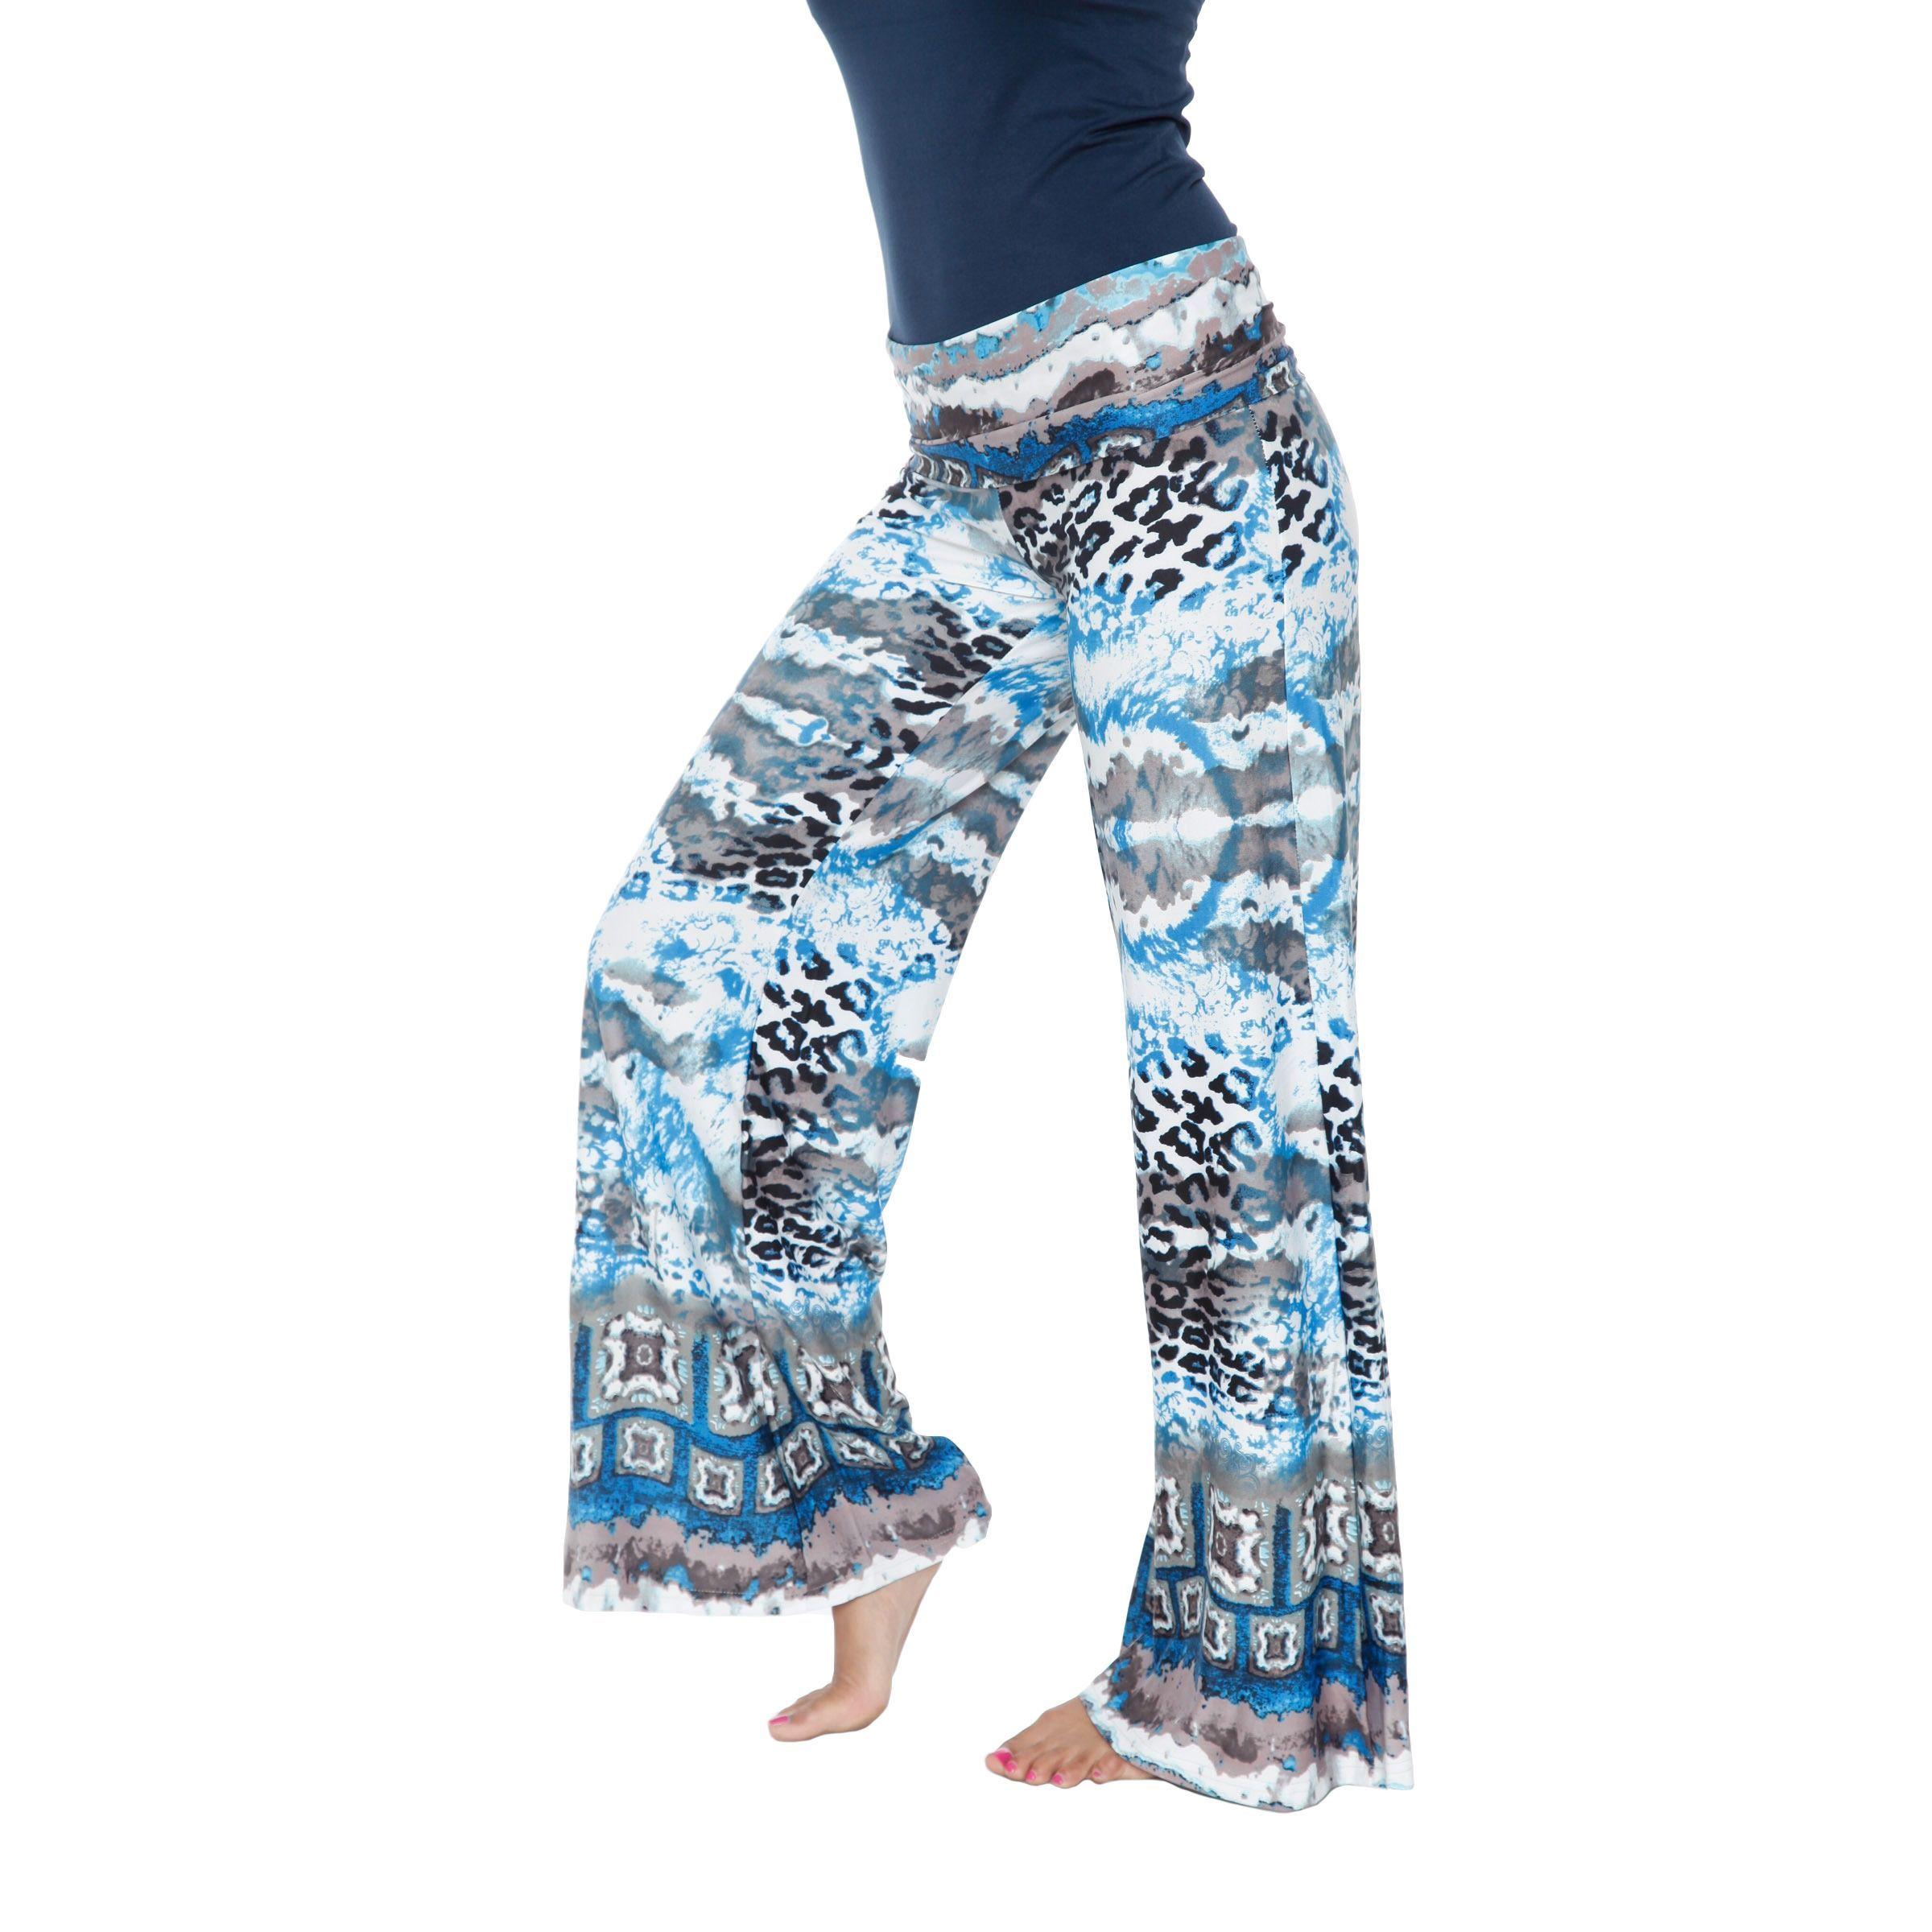 5de7d001cbf8 White Mark Women's Multi-print Palazzo Pants | Products | Pinterest ...